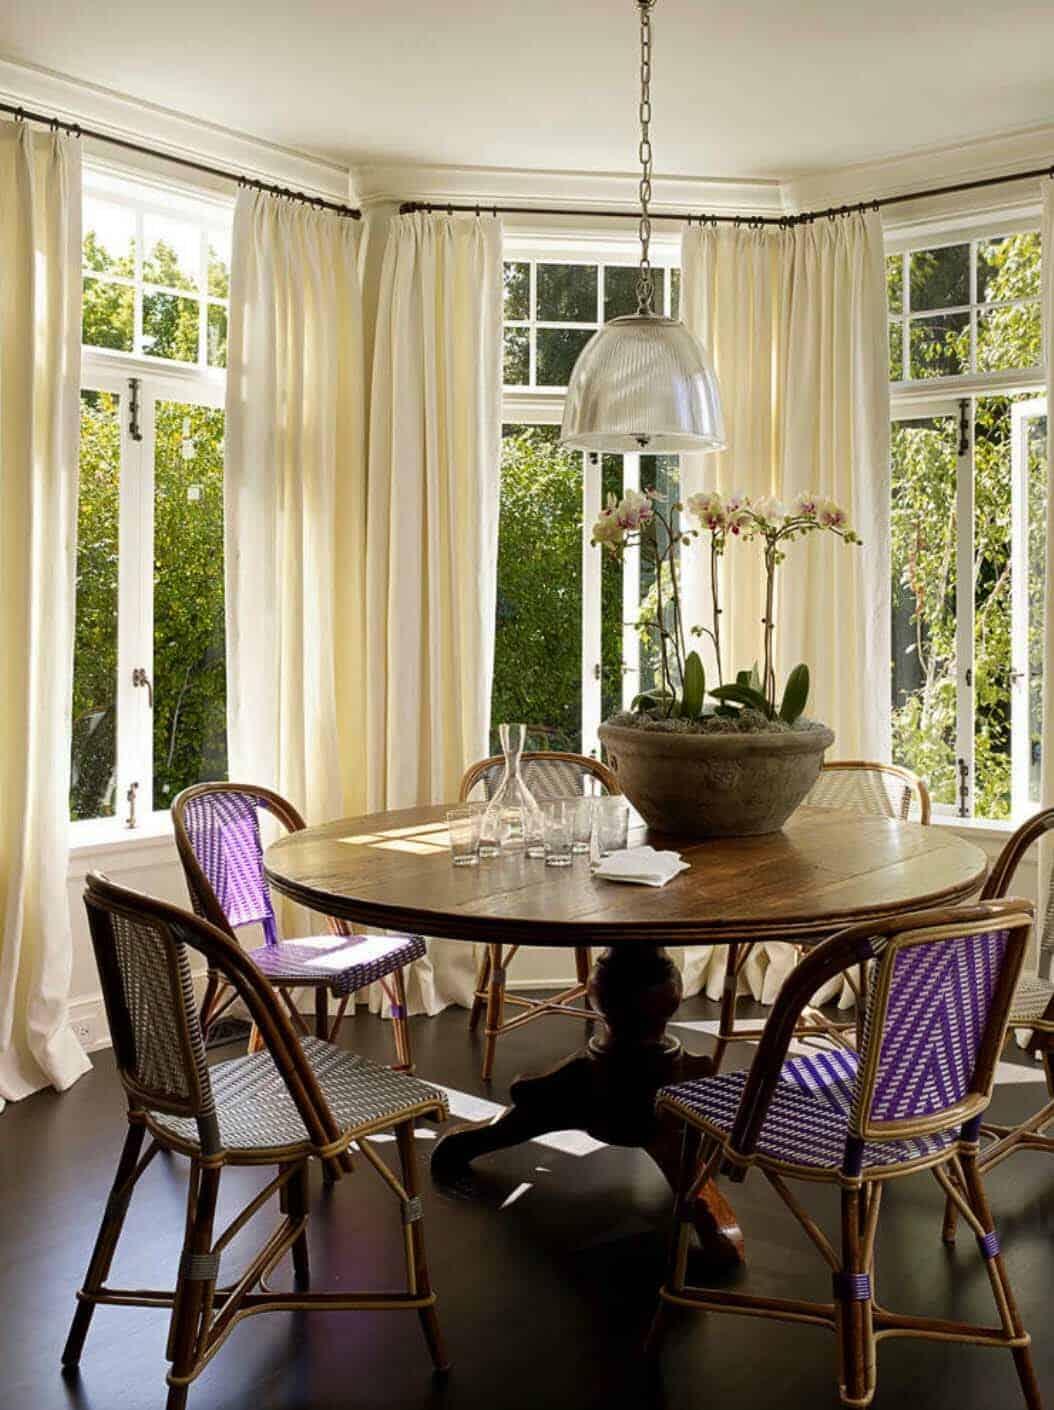 Dutch Colonial Revival gets an elegant refresh in San